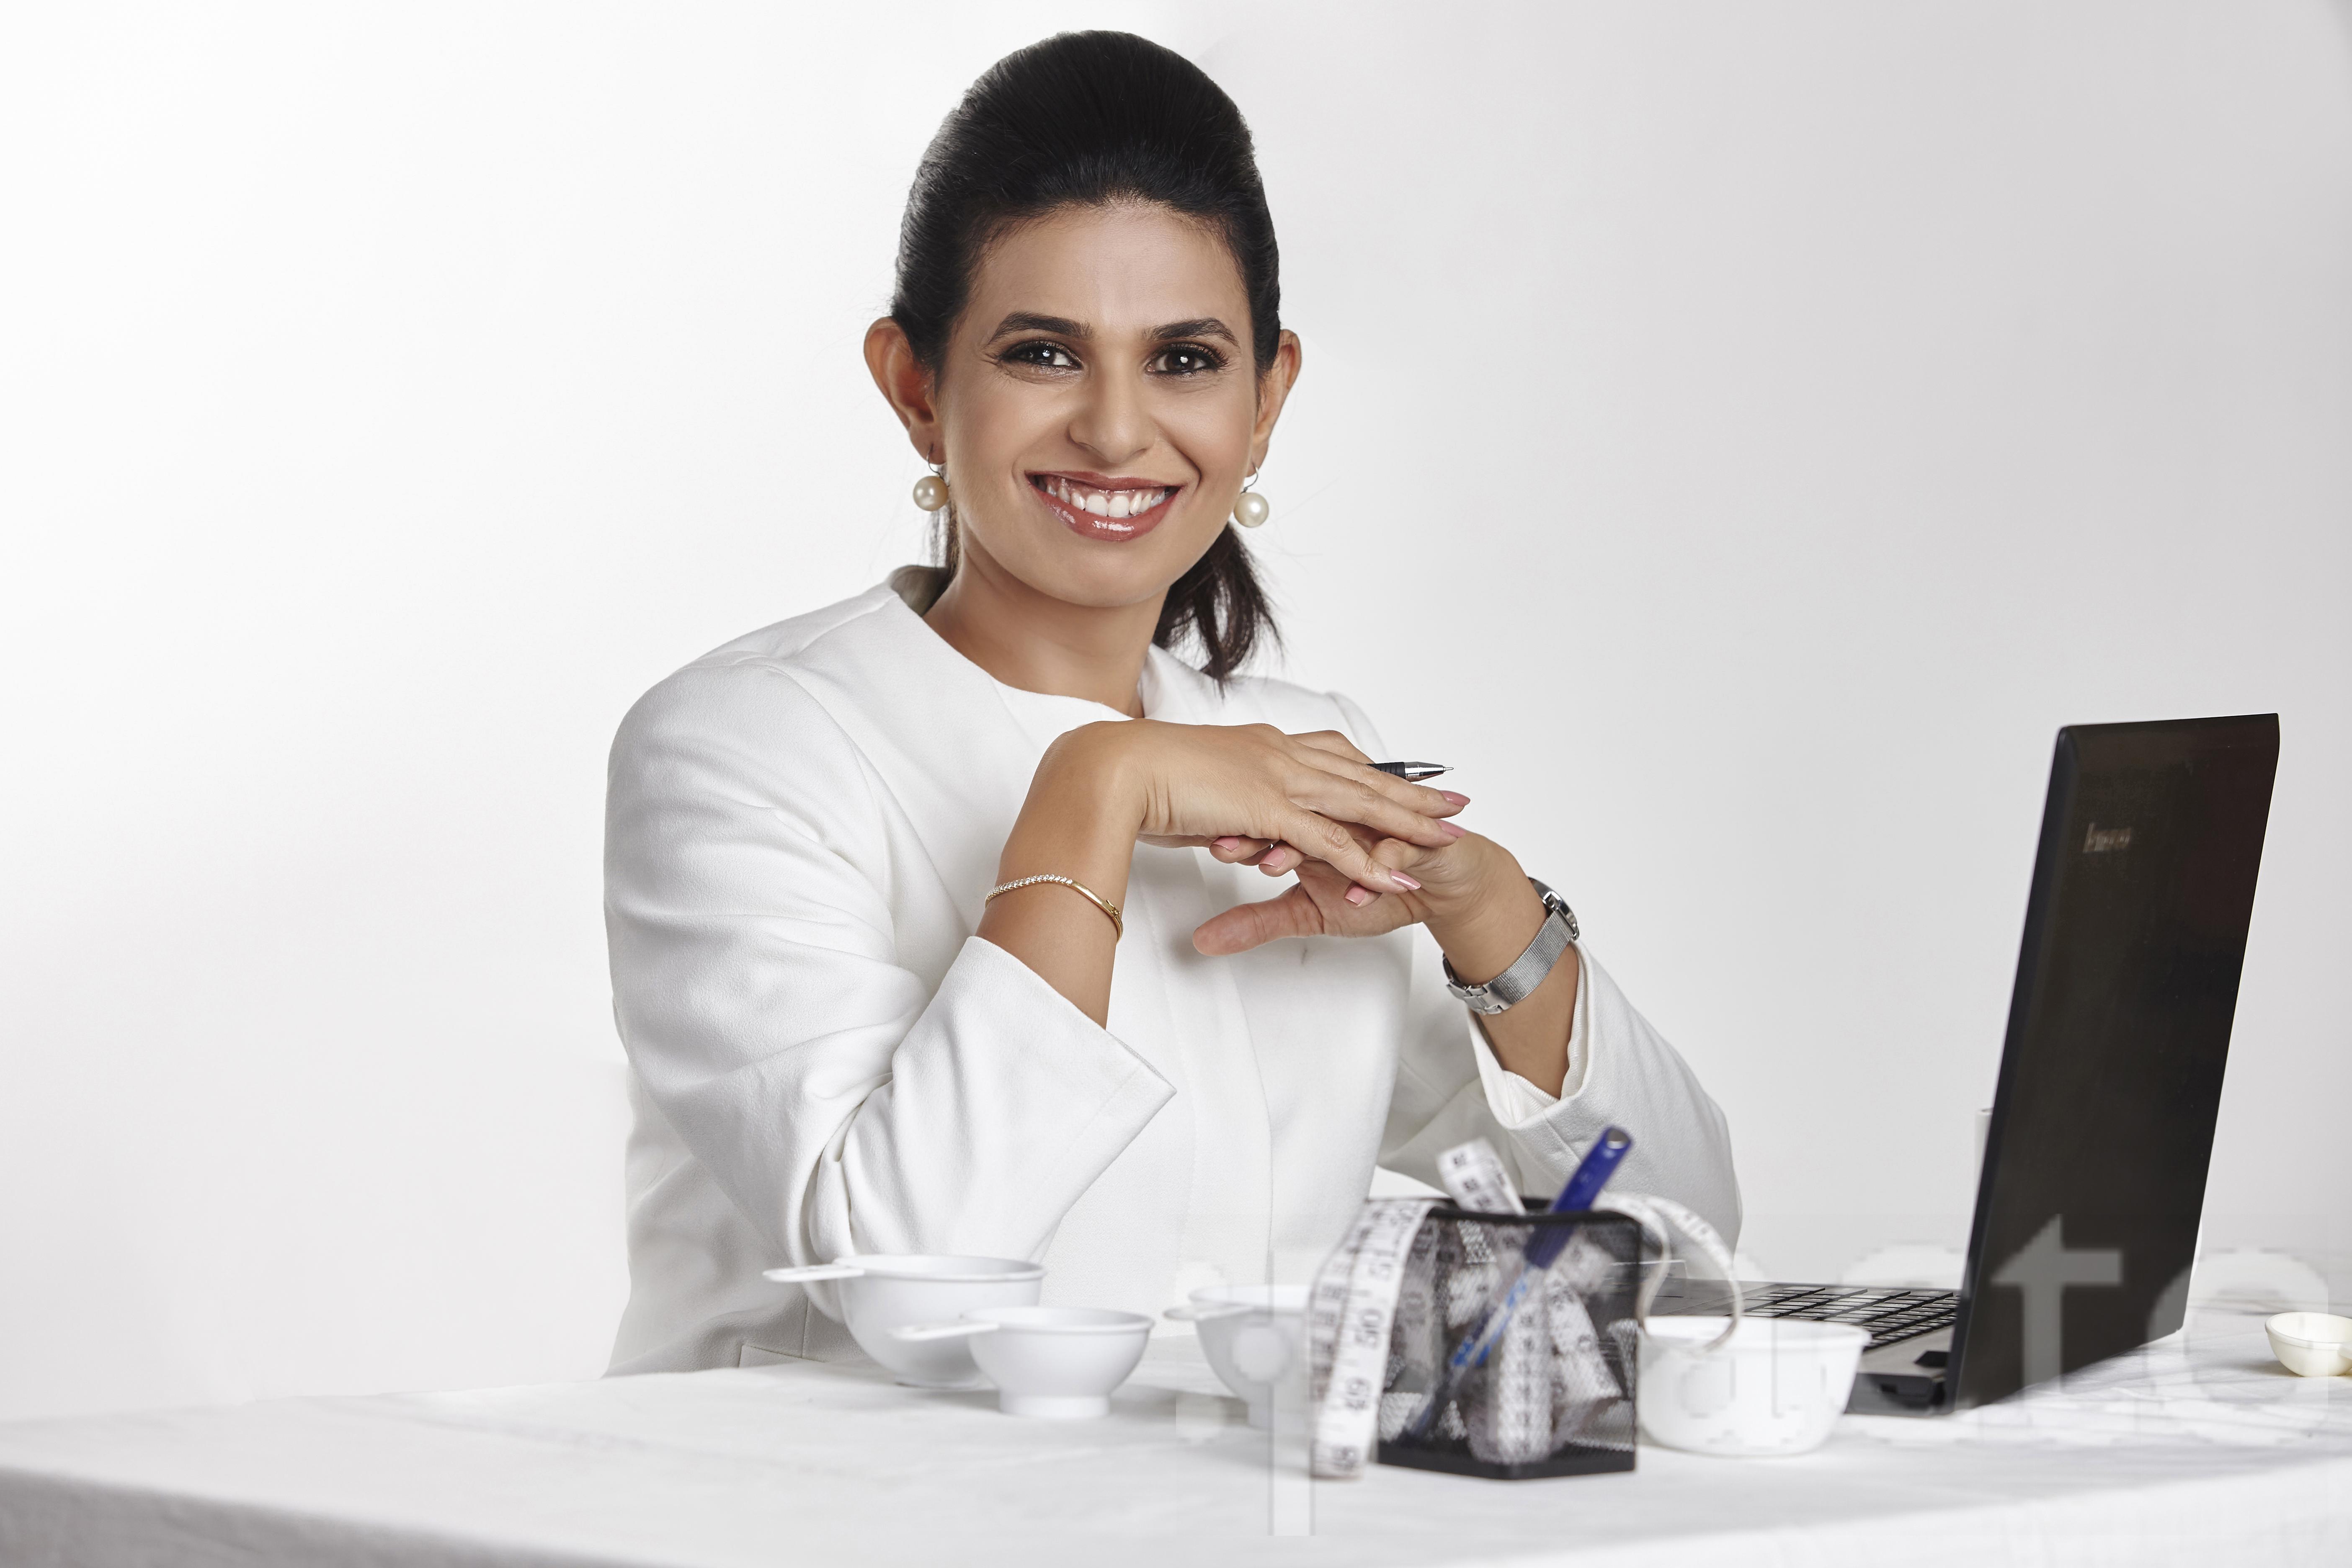 Ms. Avanti Deshpande - Dietitian/Nutritionist